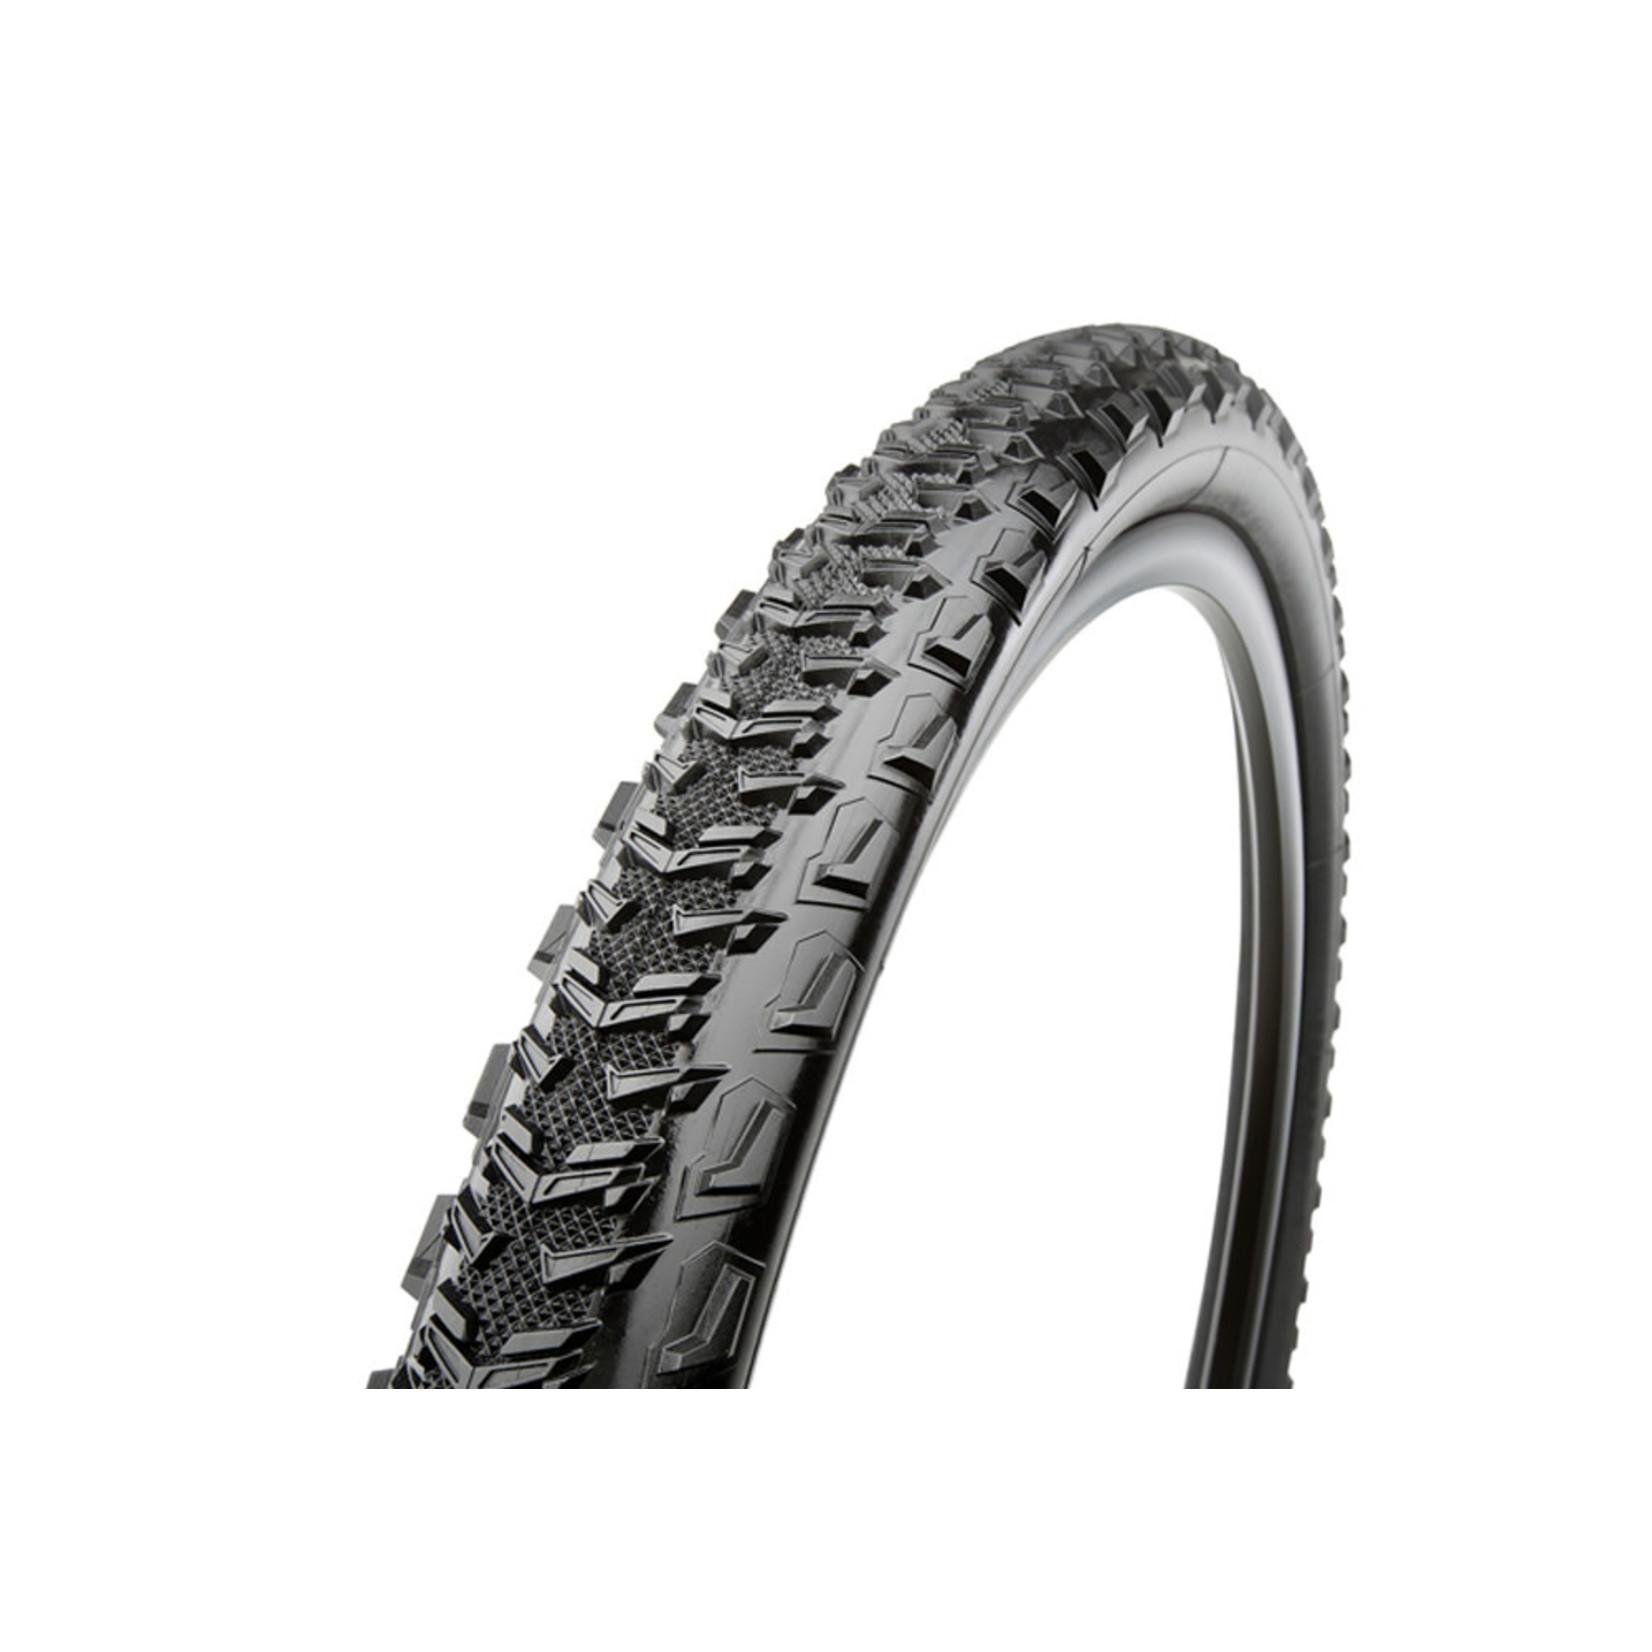 Geax Geax Tire Mezcal 27.5x2.1